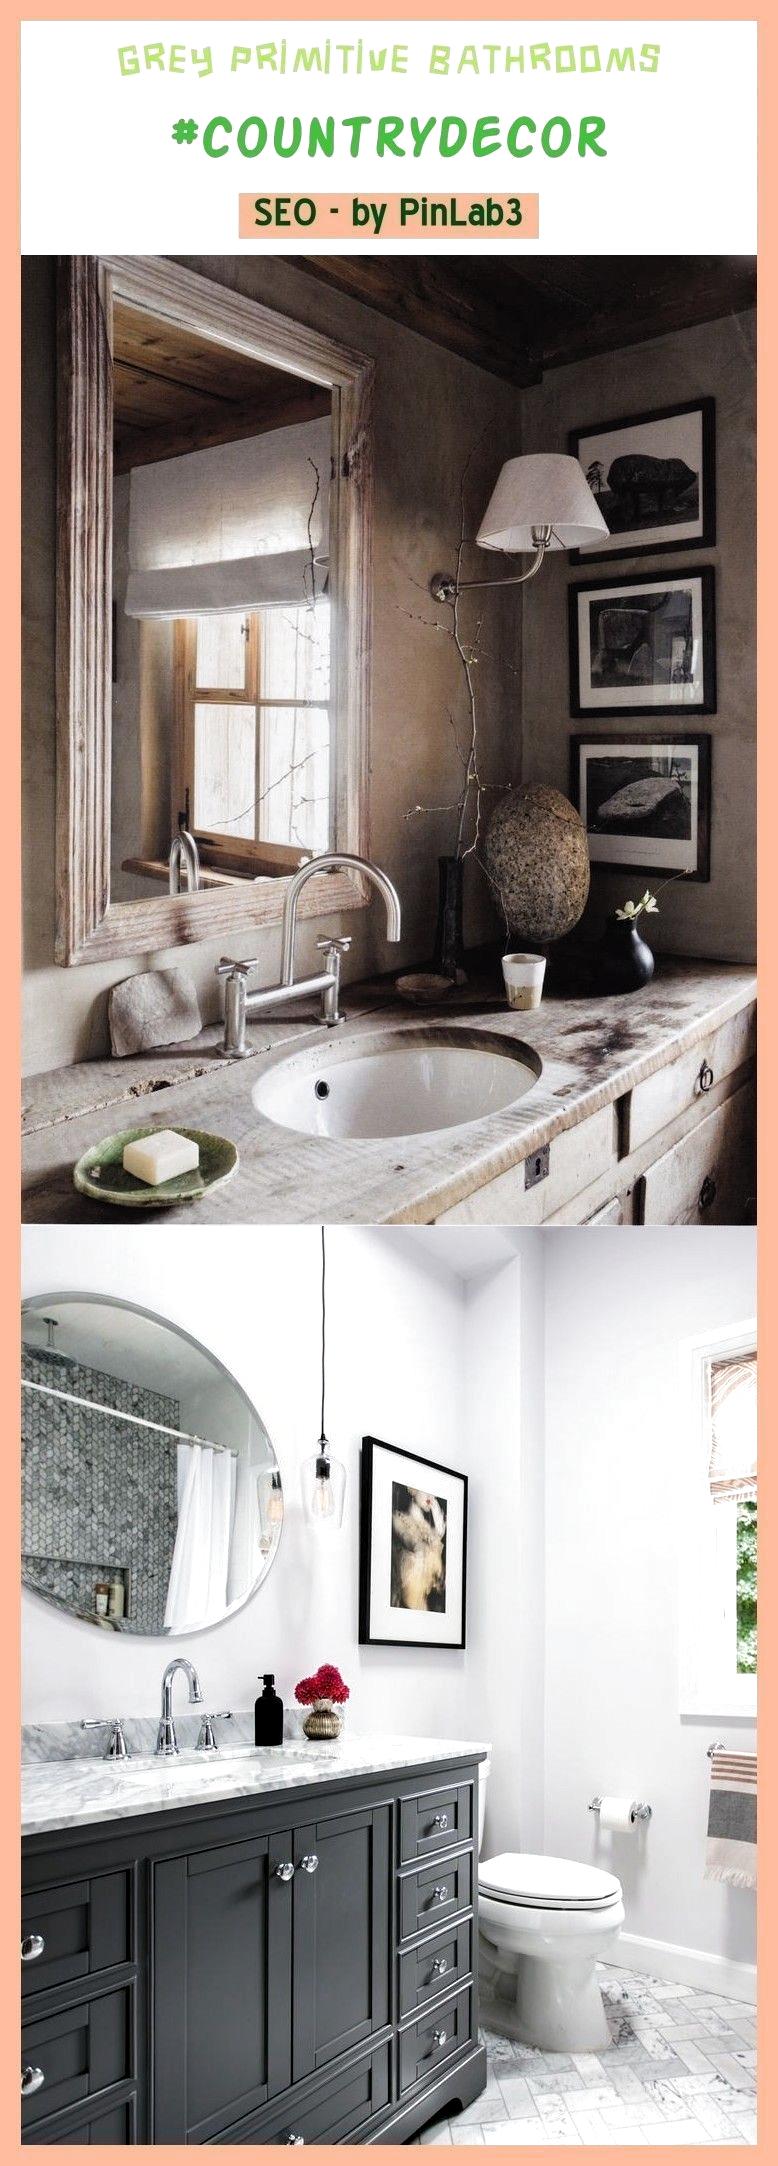 Photo of bathroom sink ideas small #bathroom #sink #ideas #bathroom  bathroom sink ideas …